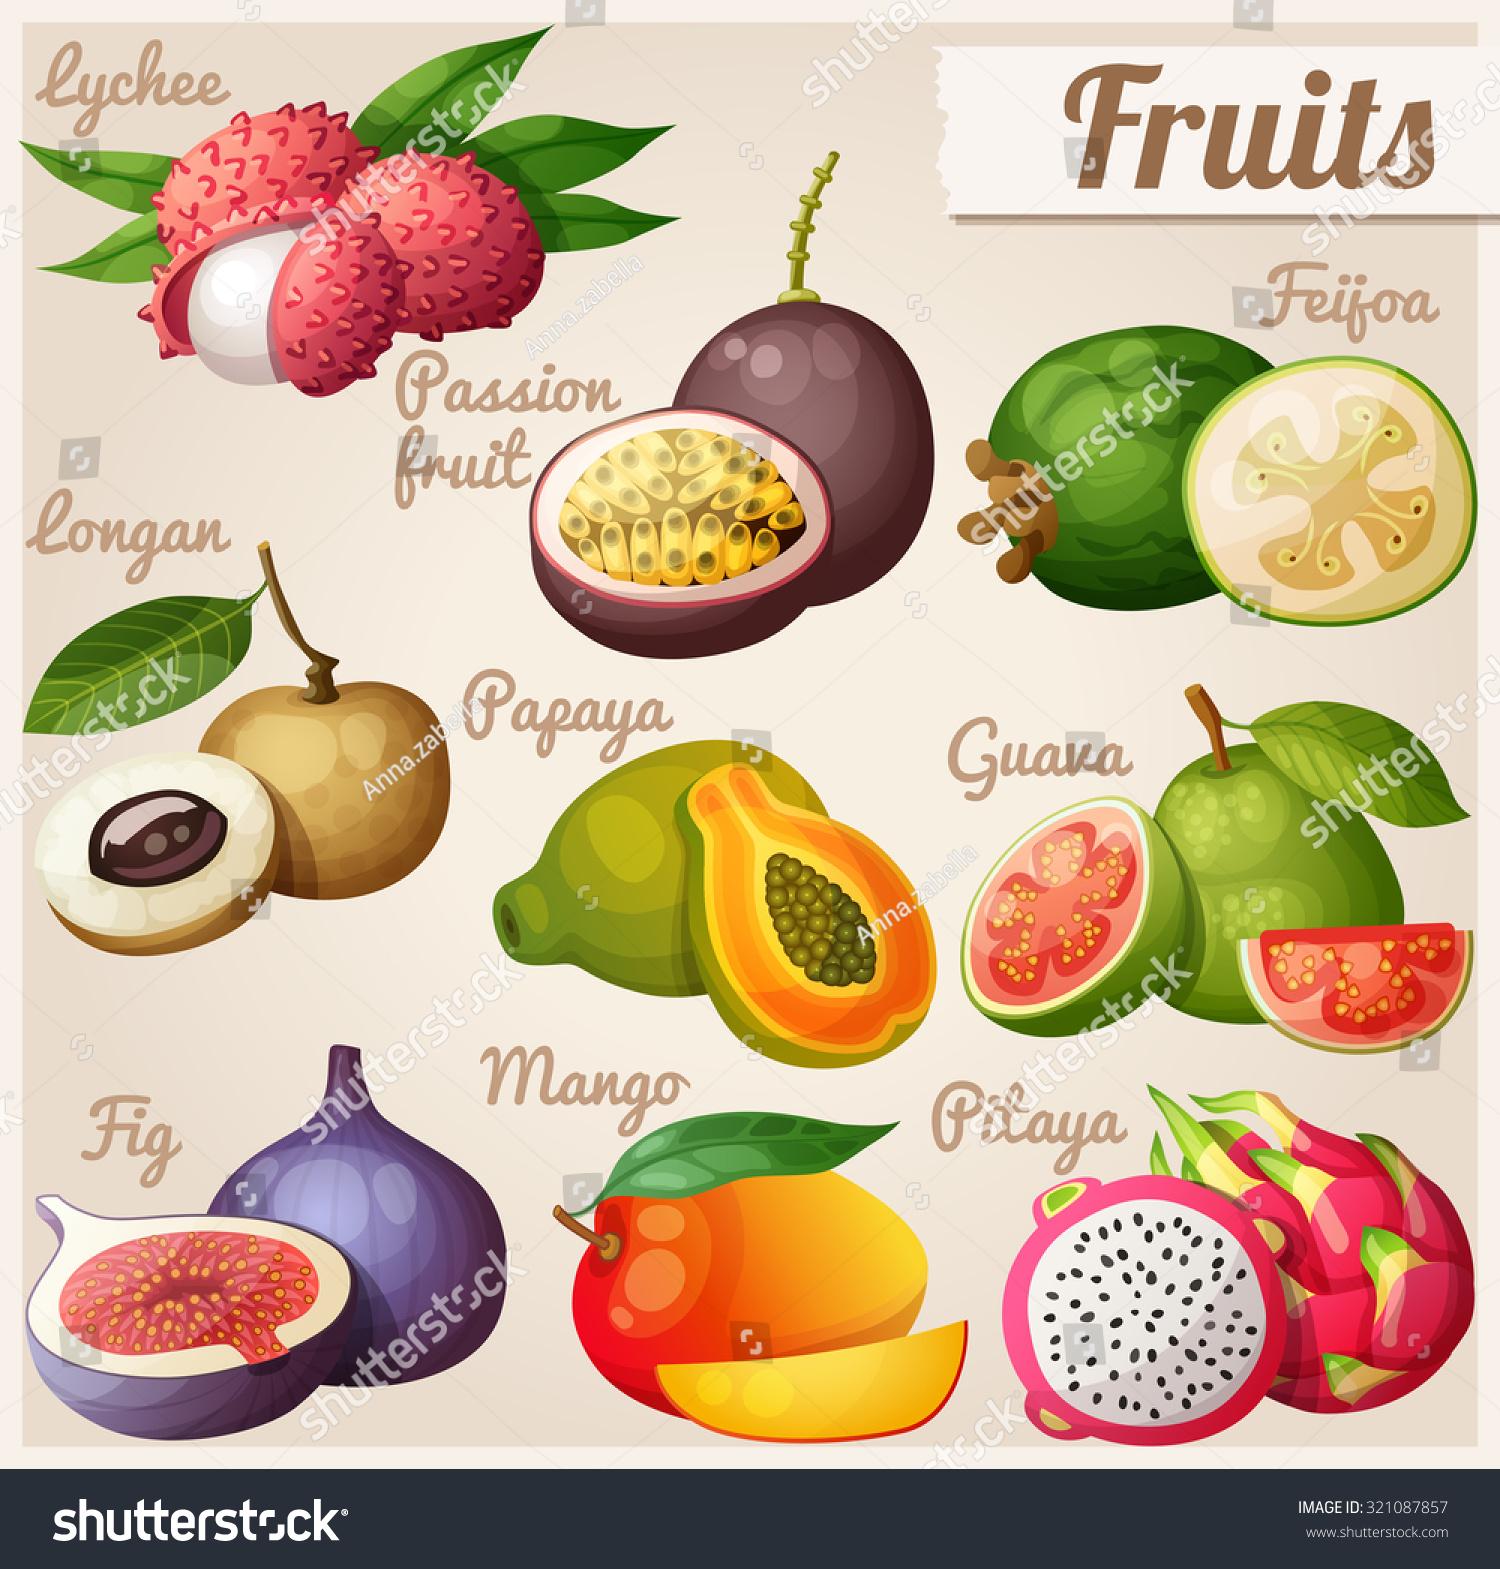 papaya fruit by their fruits